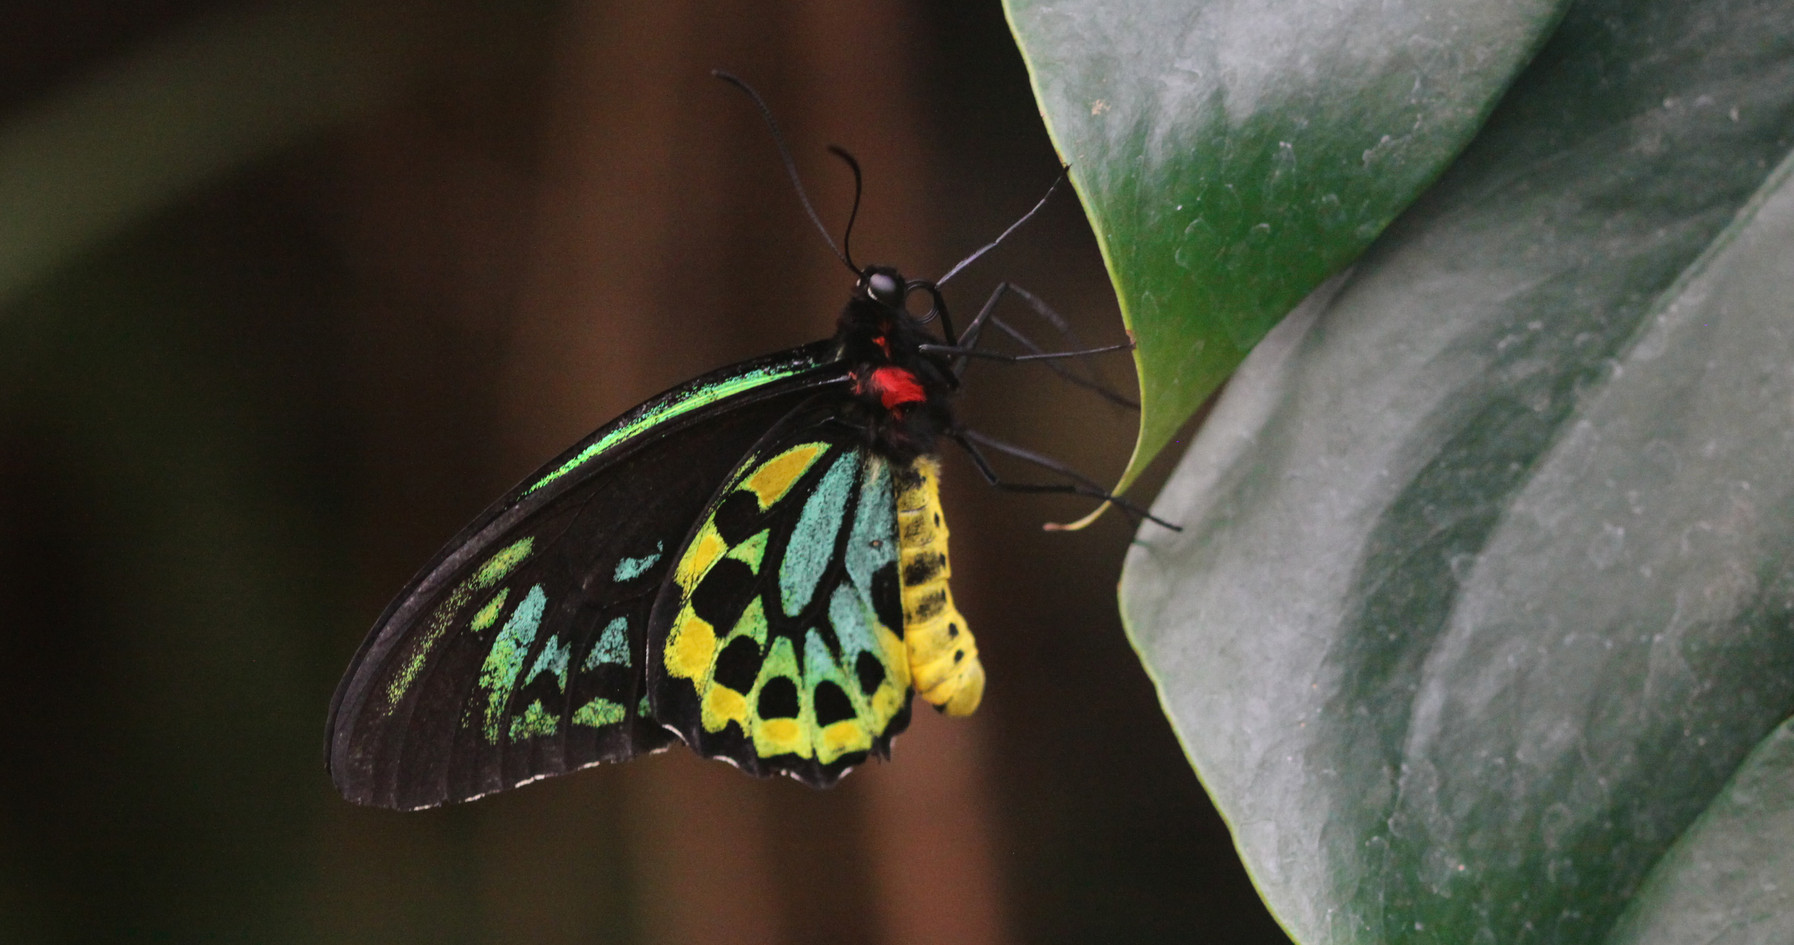 A Birdwing